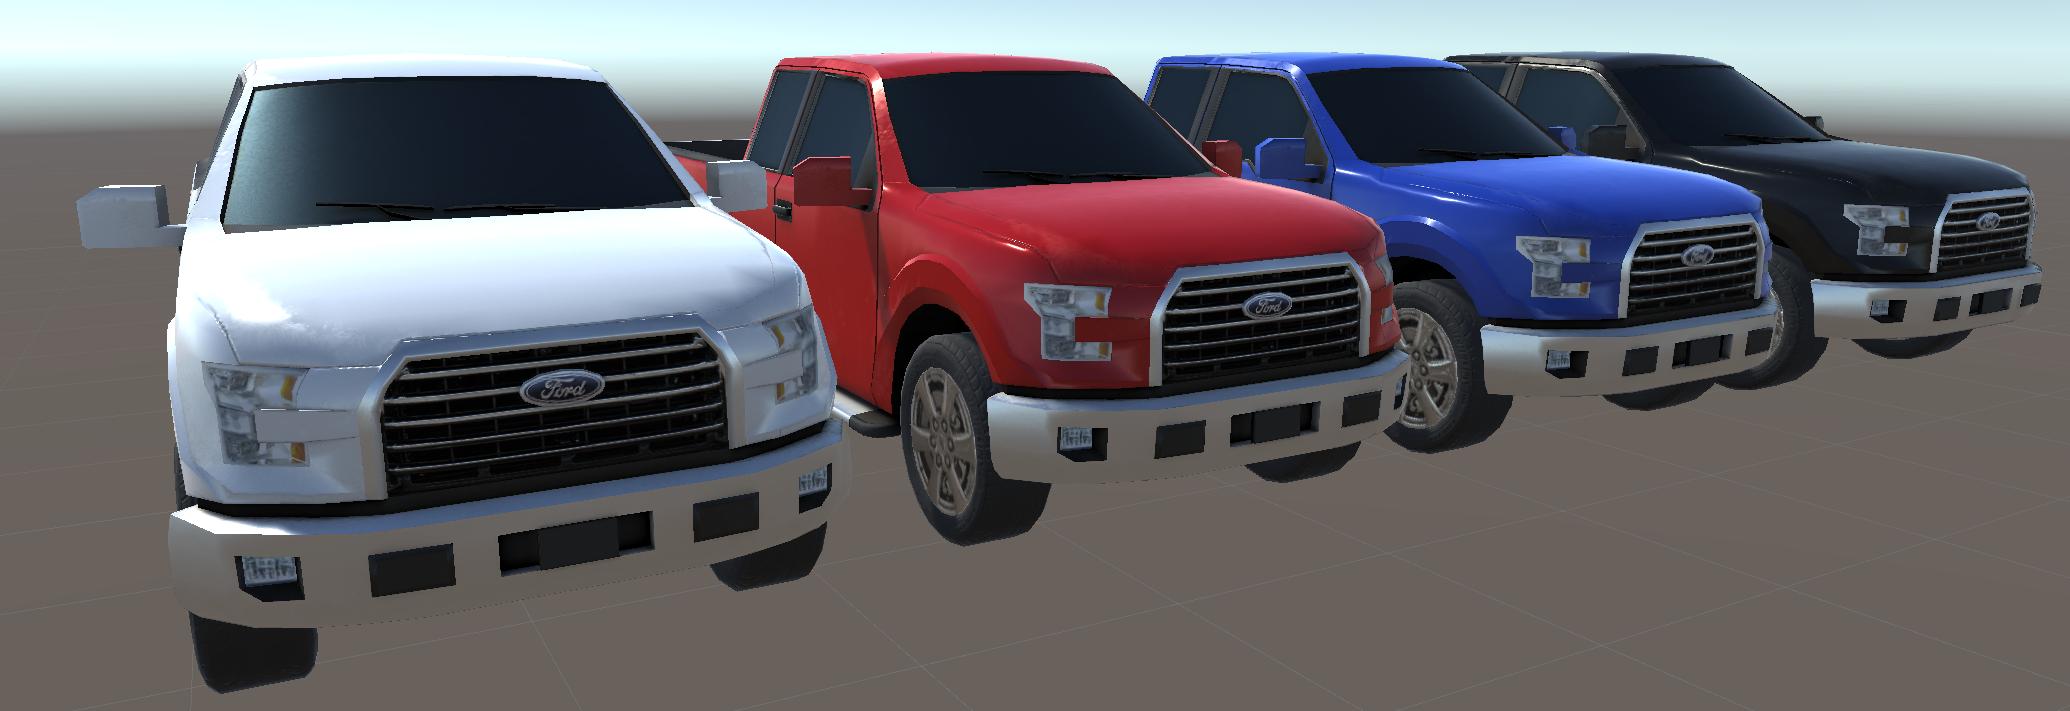 truck_colors